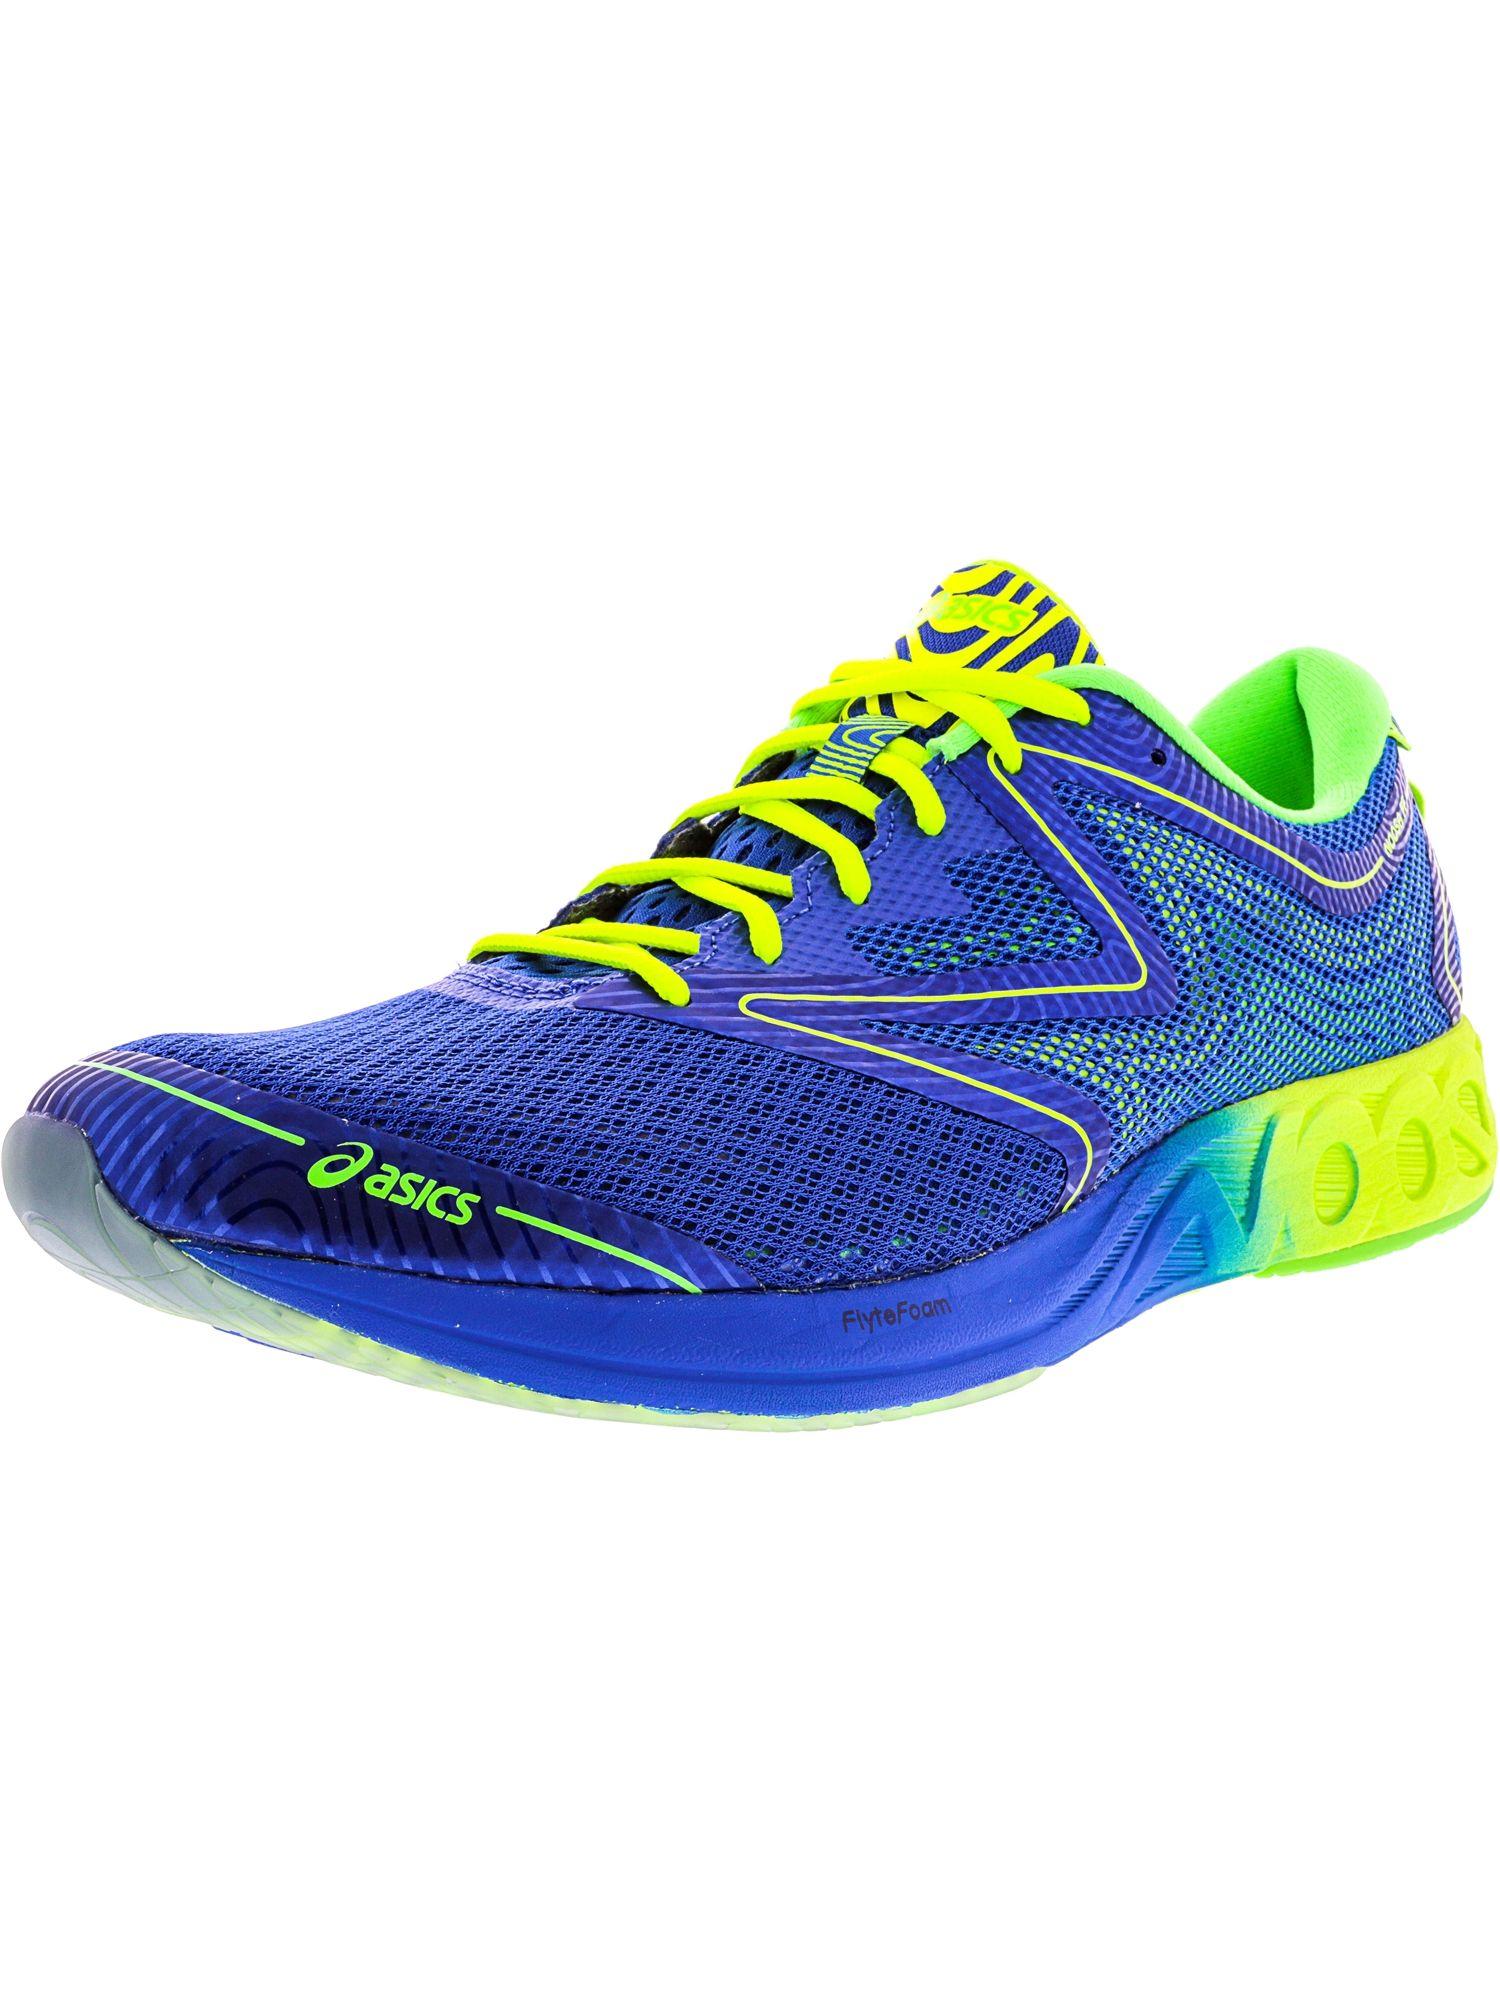 Asics Men S Noosa Ff Ankle High Running Shoe In Blue Modesens Running Shoes Asics Men Shoes